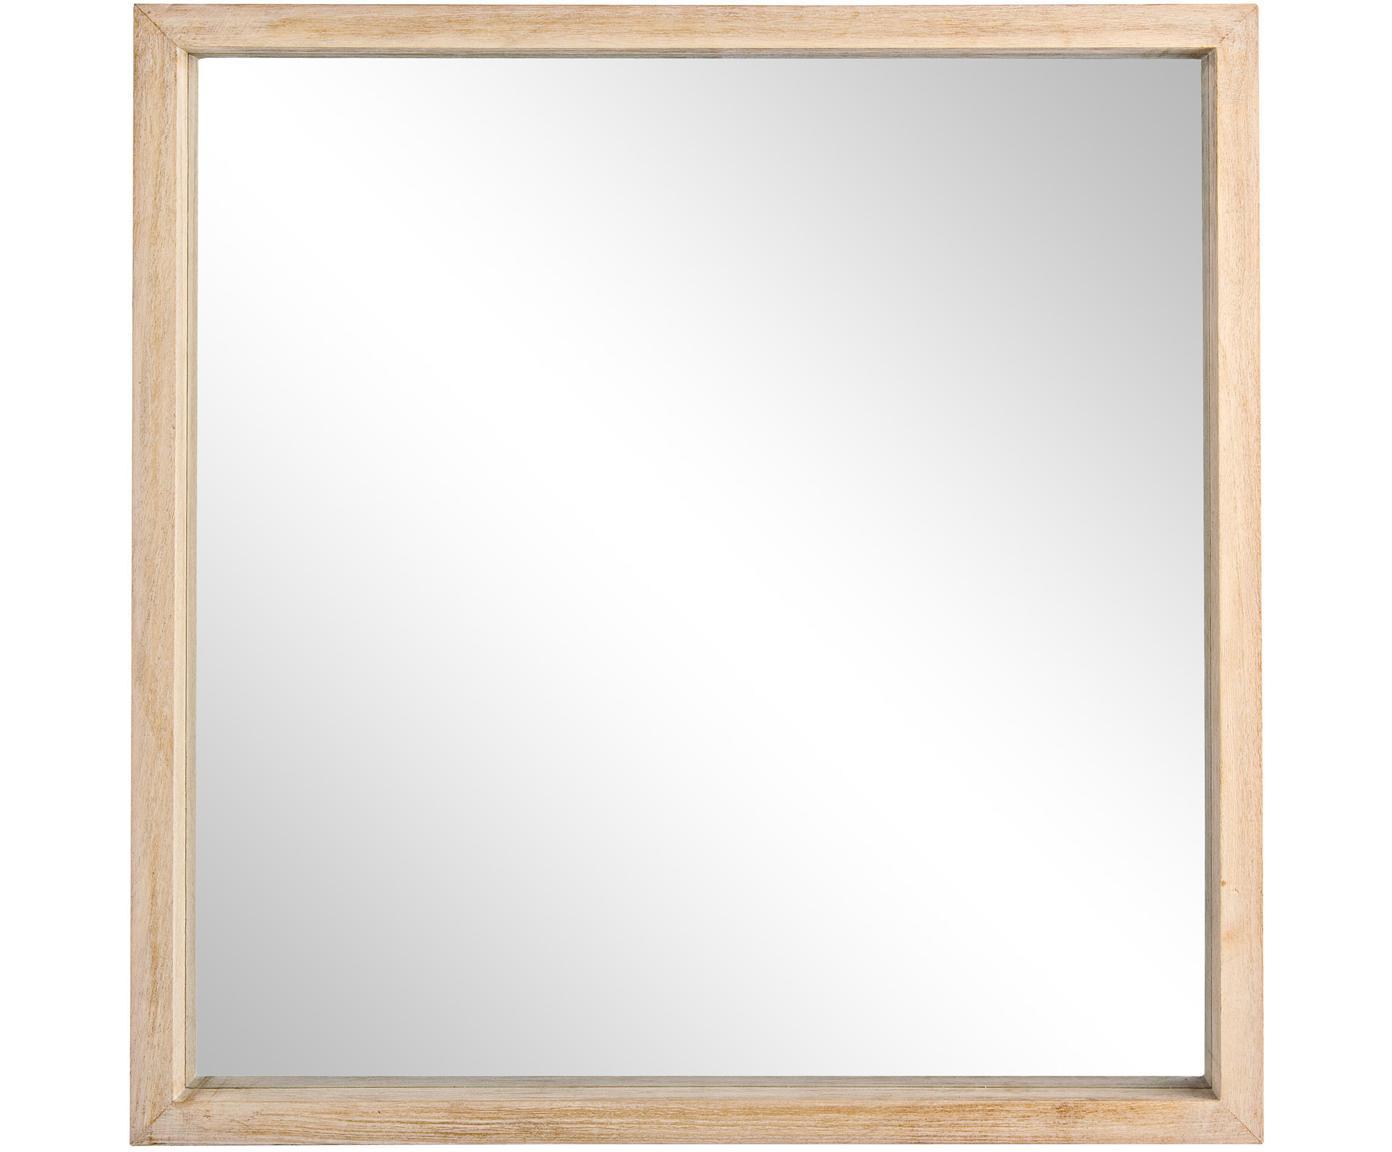 Wandspiegel Tiziano met houten lijst, Lijst: paulowniahout, Paulowniahoutkleurig, 52 x 52 cm